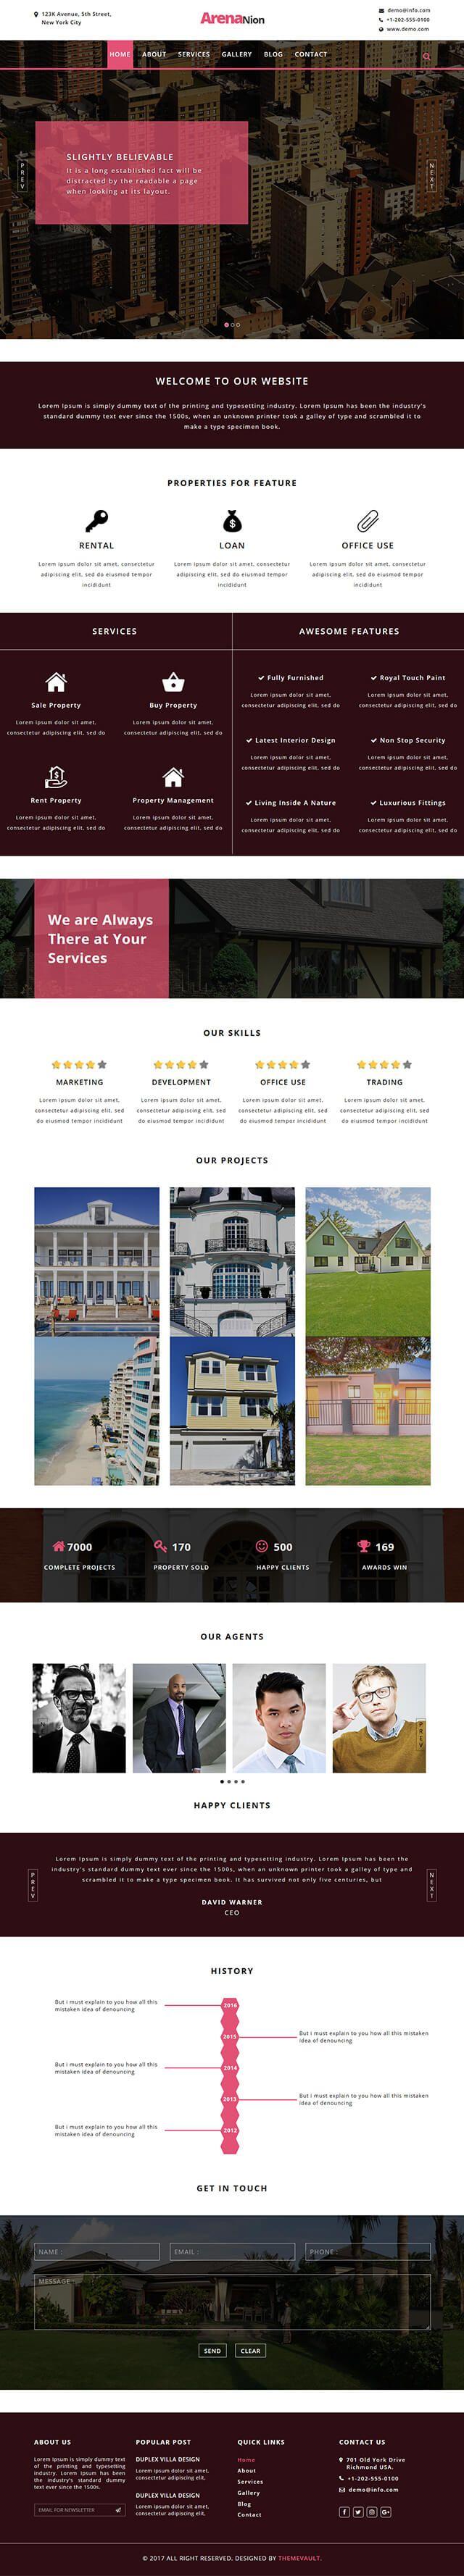 ArenaNion - Free Multipurpose html5 Real Estate Template